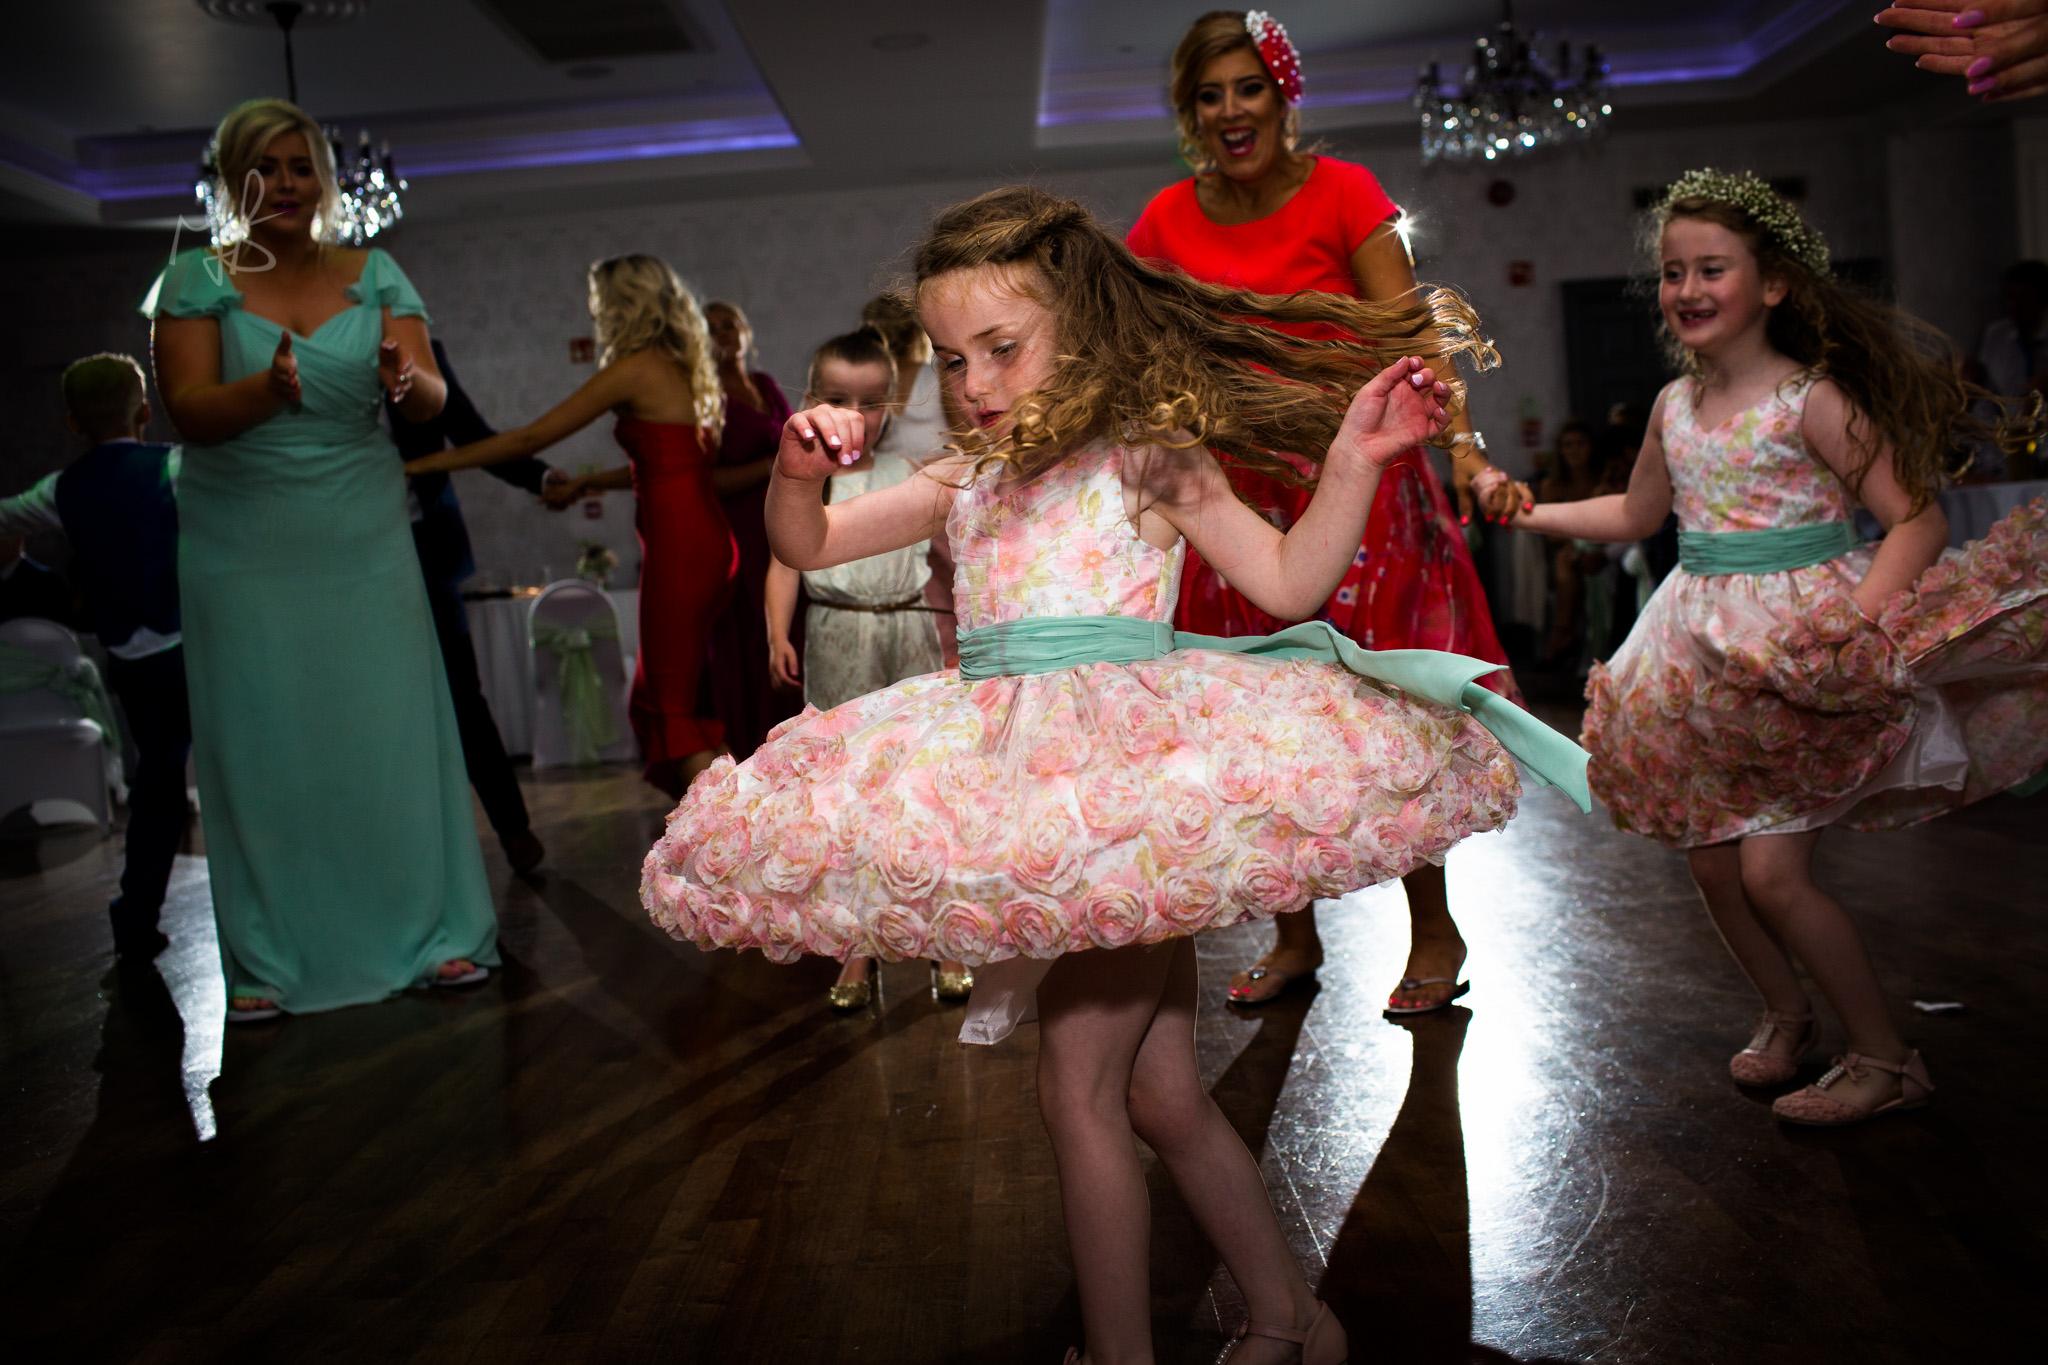 Northern-Ireland-Wedding-Photographer-Mark-Barnes-Ballymena_wedding-photography-Leighinmohr-House-Seamas_Alanna_For-web-68.jpg